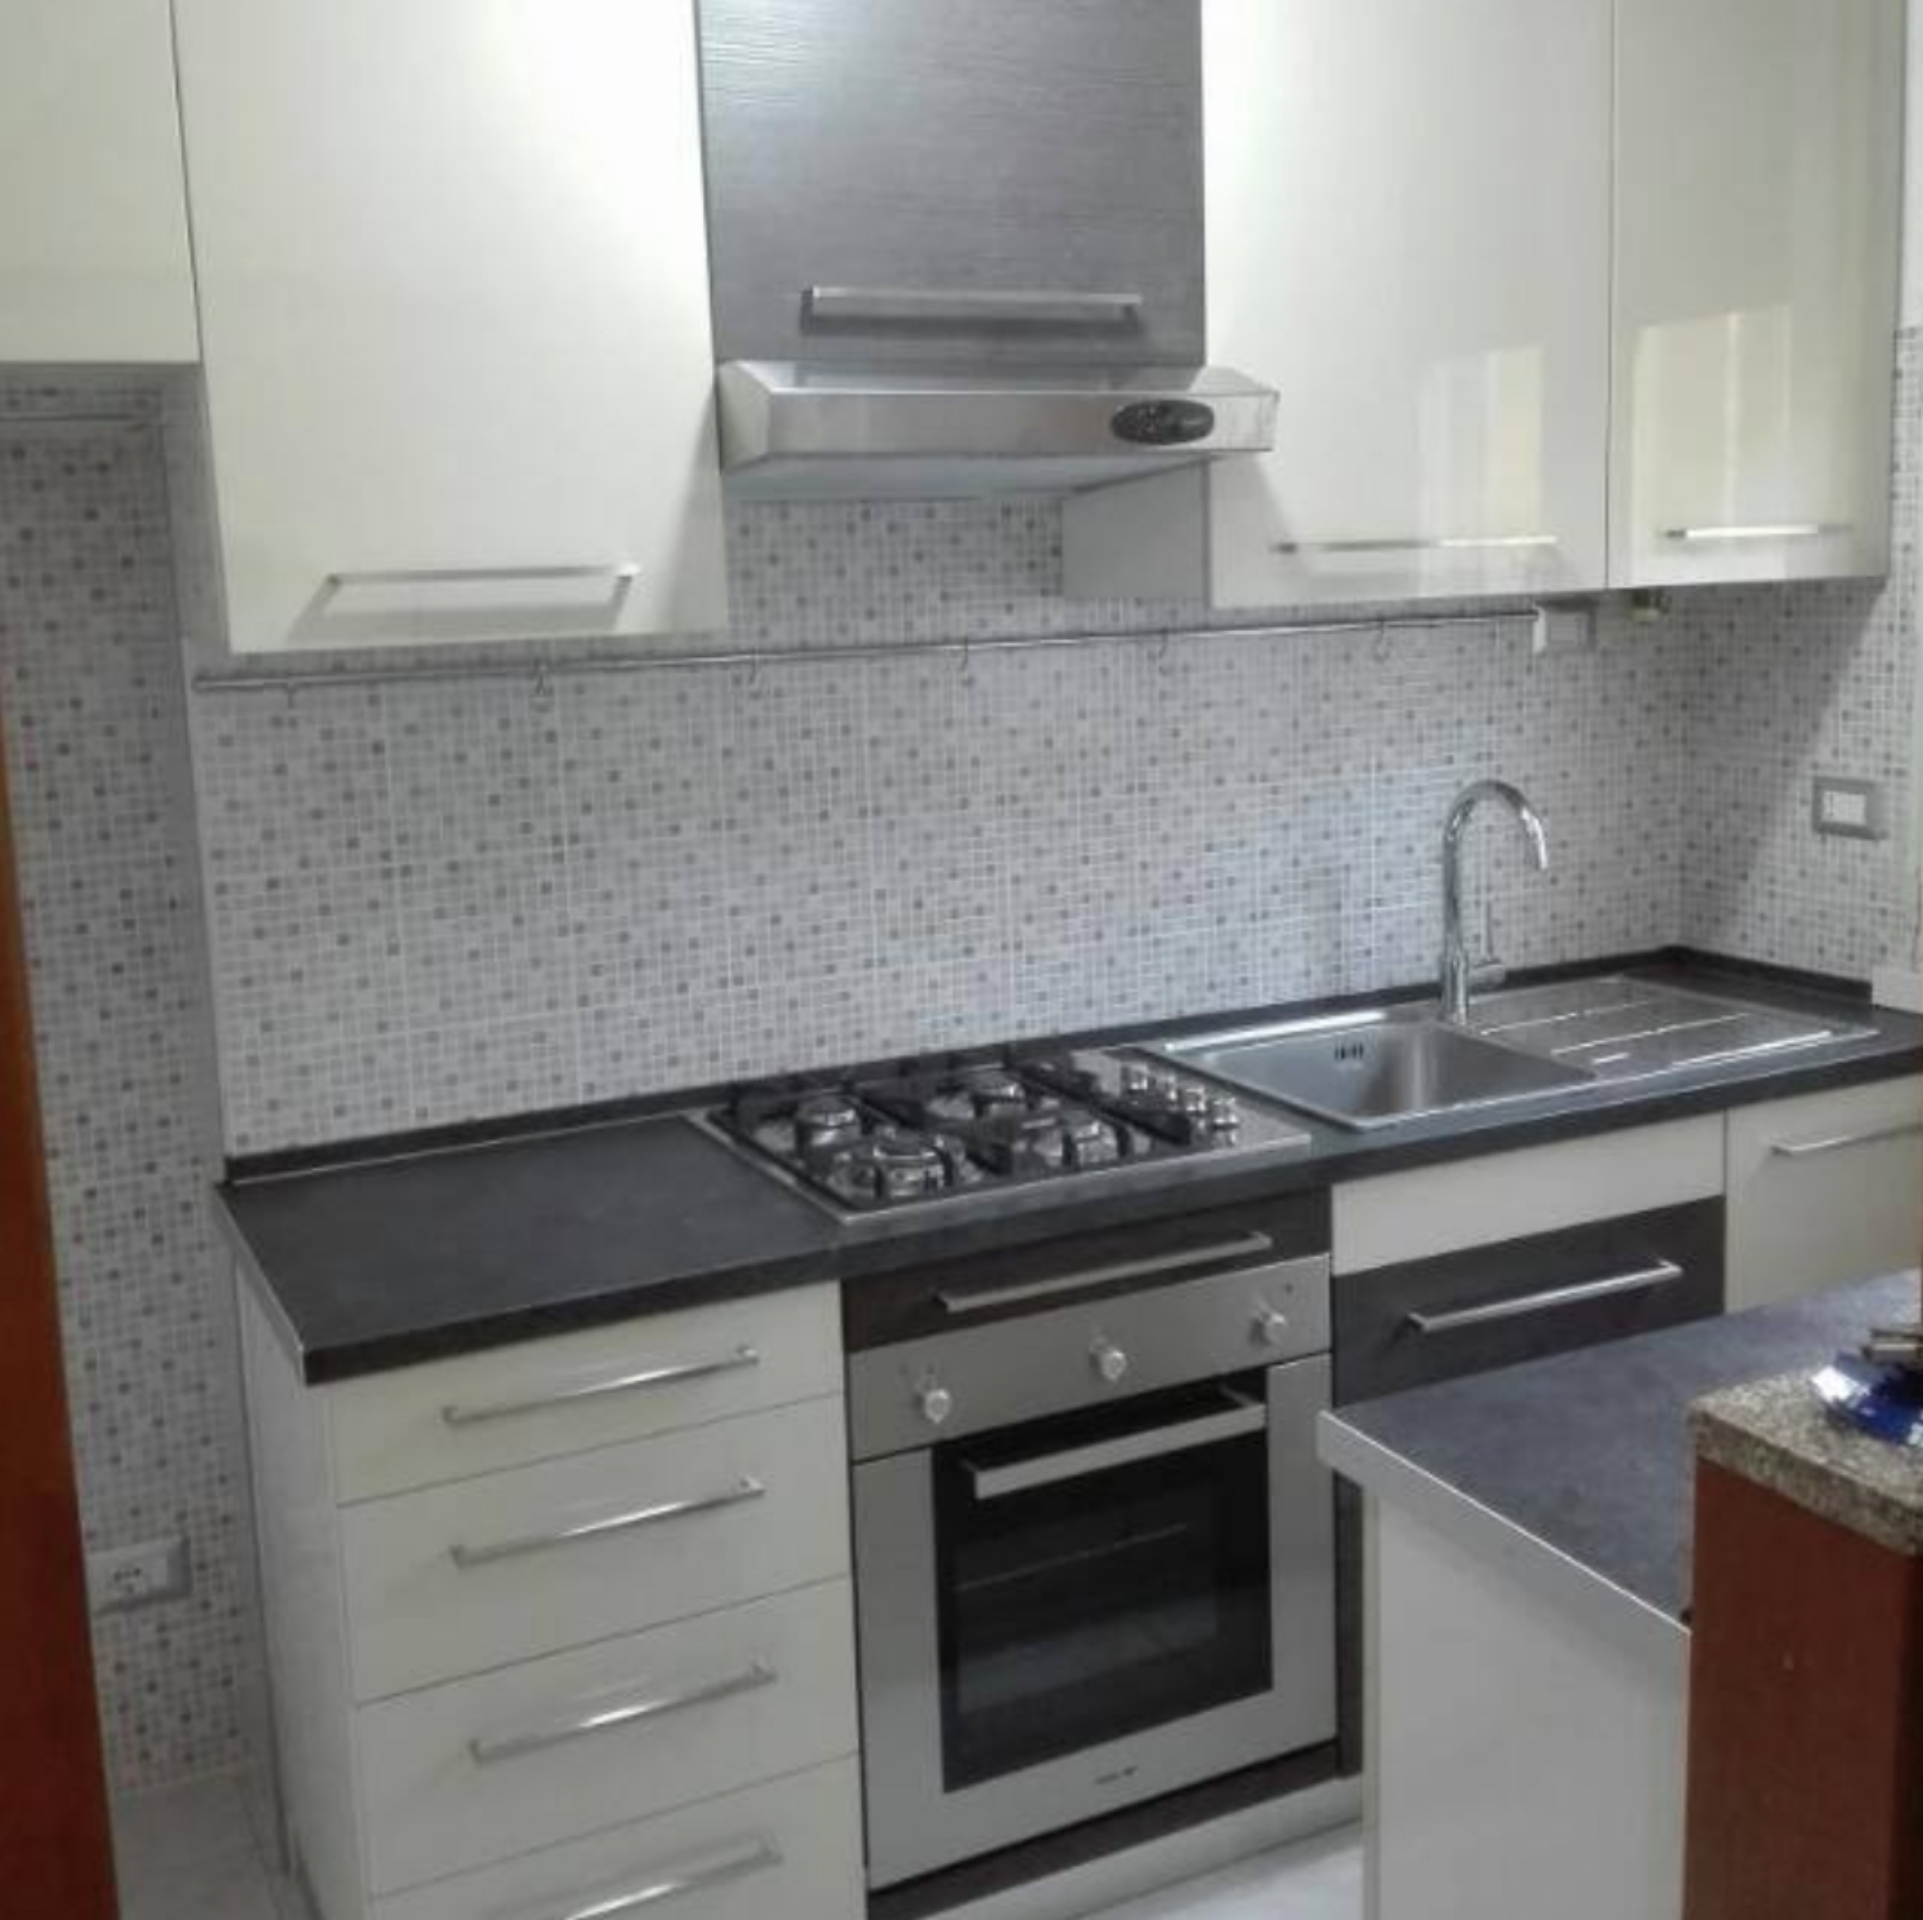 https://www.falegnamepersonale.it/cucine-artigianali-su-misura/